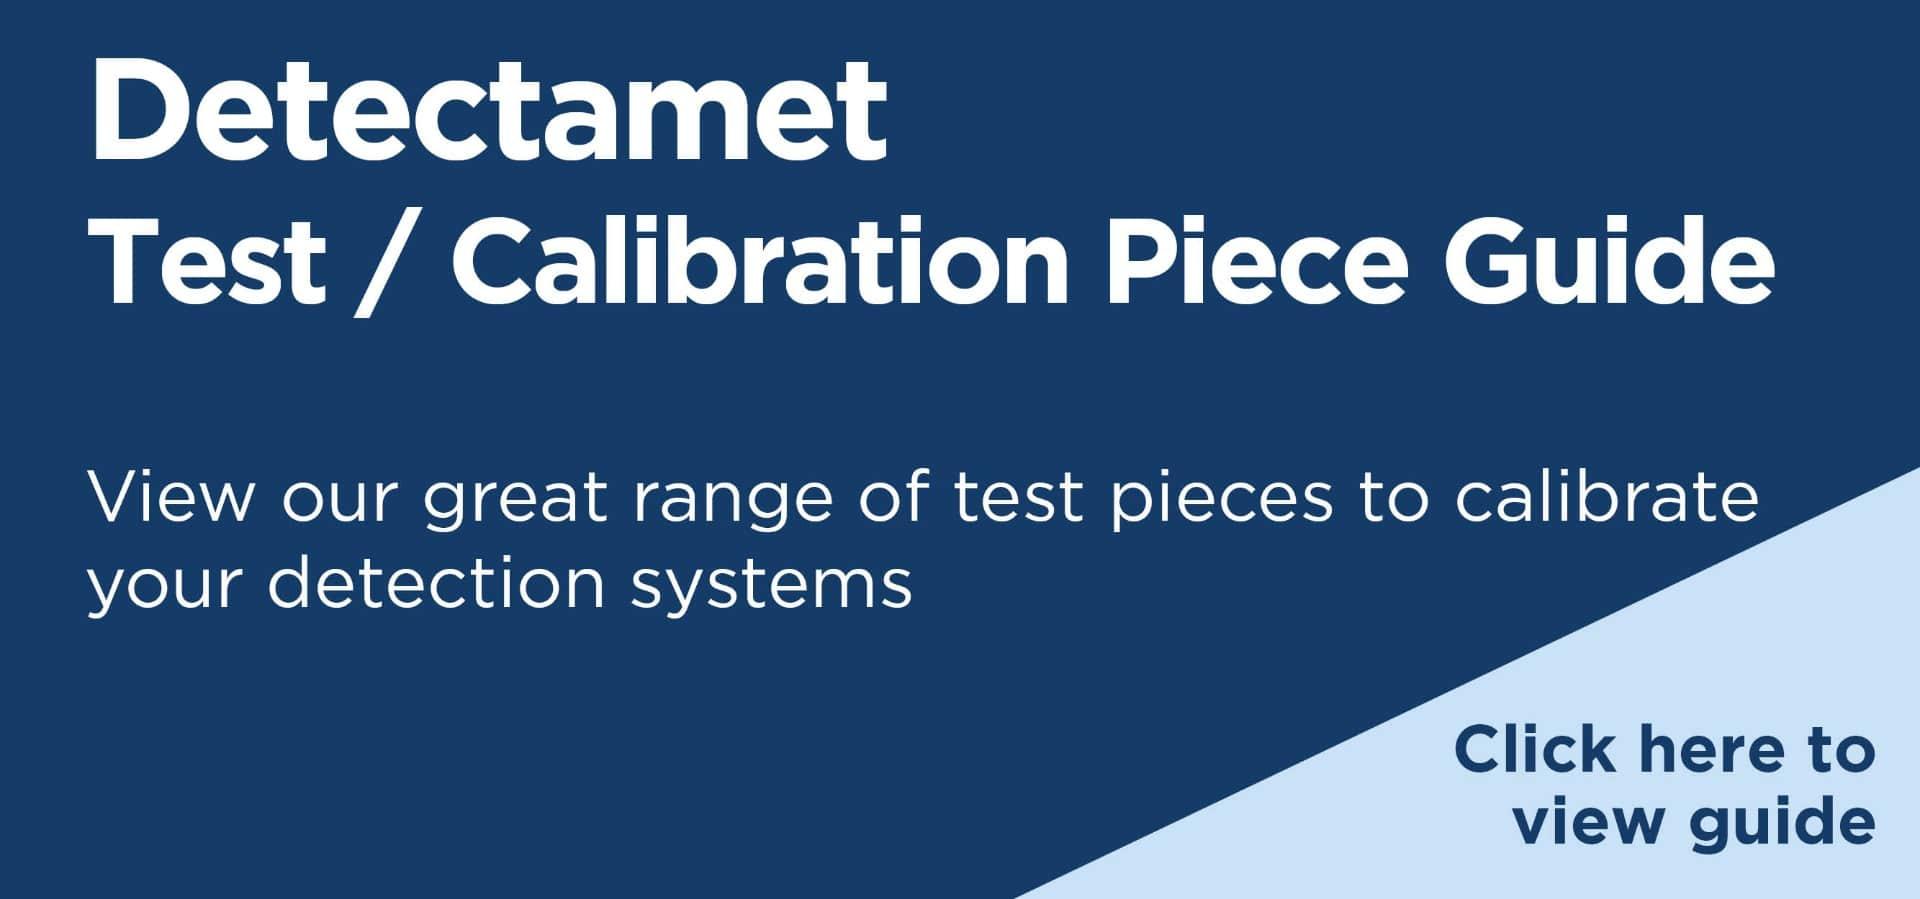 Detectamet Test Pieces Guide